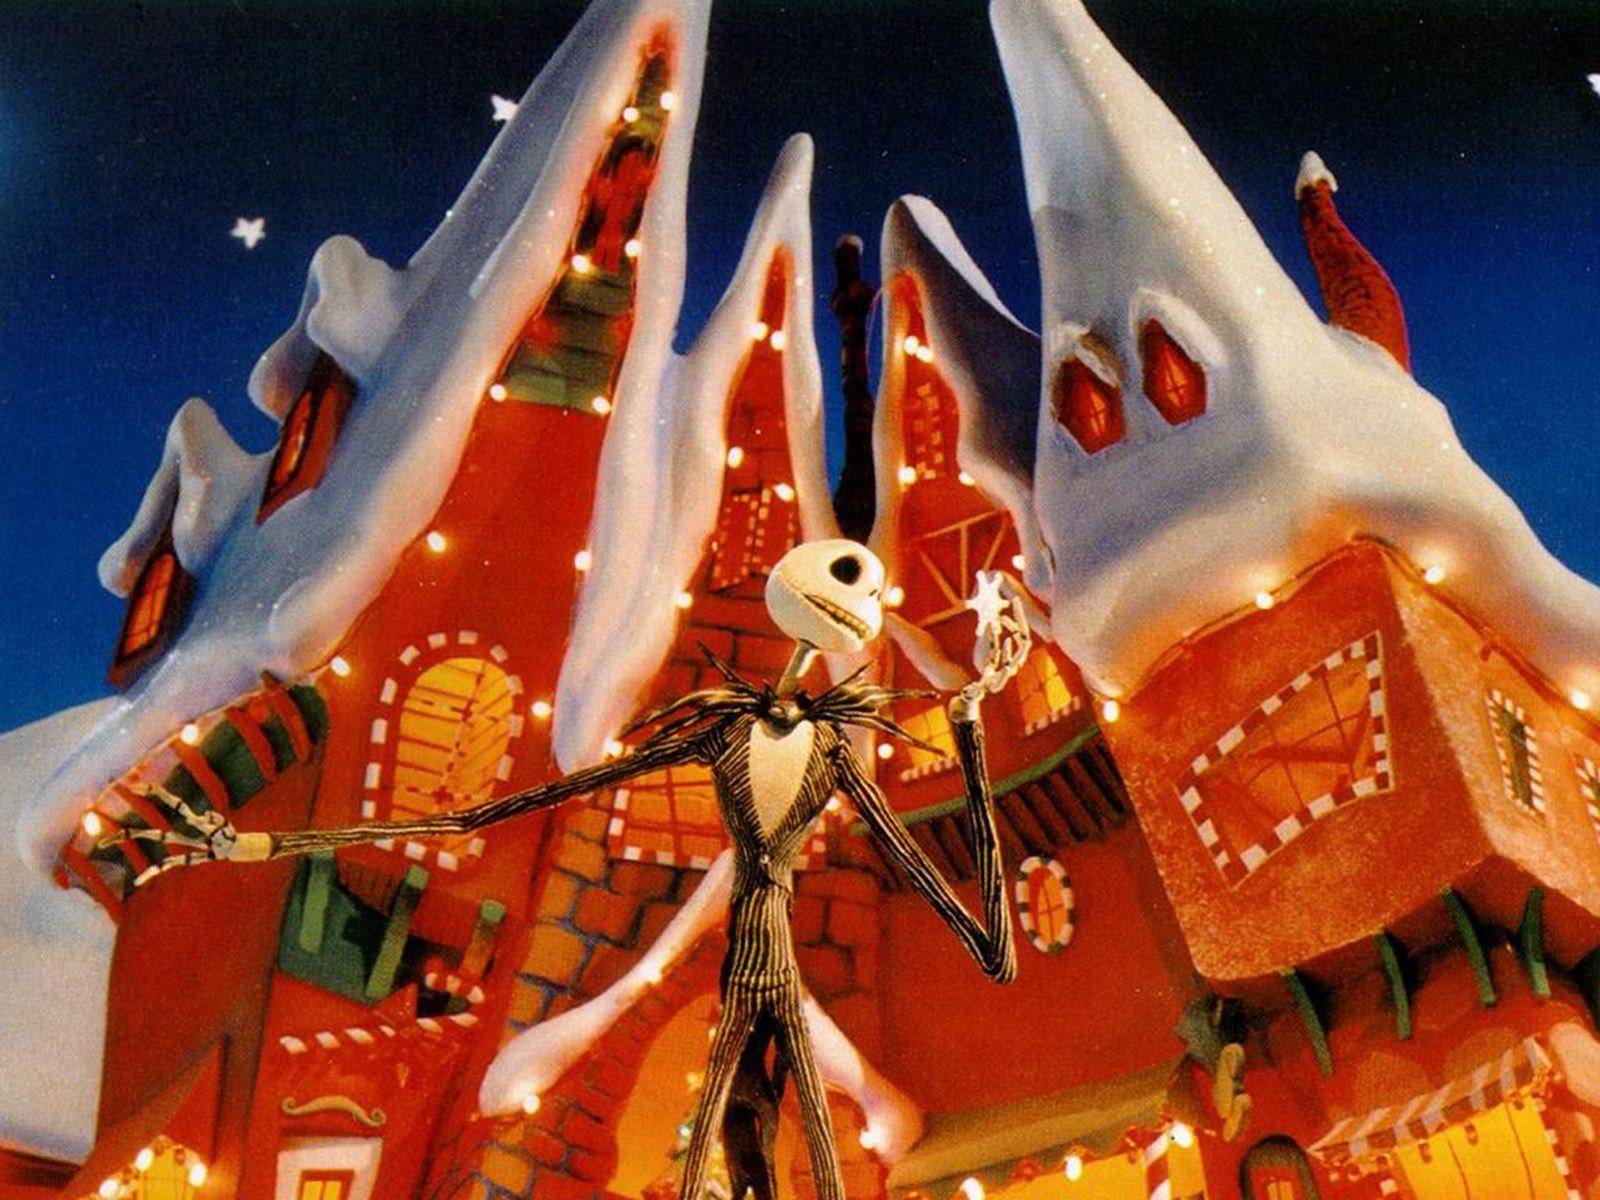 Nightmare Before Christmas Nightmare Before Christmas Wallpaper Nightmare Before Christmas Movie Nightmare Before Christmas